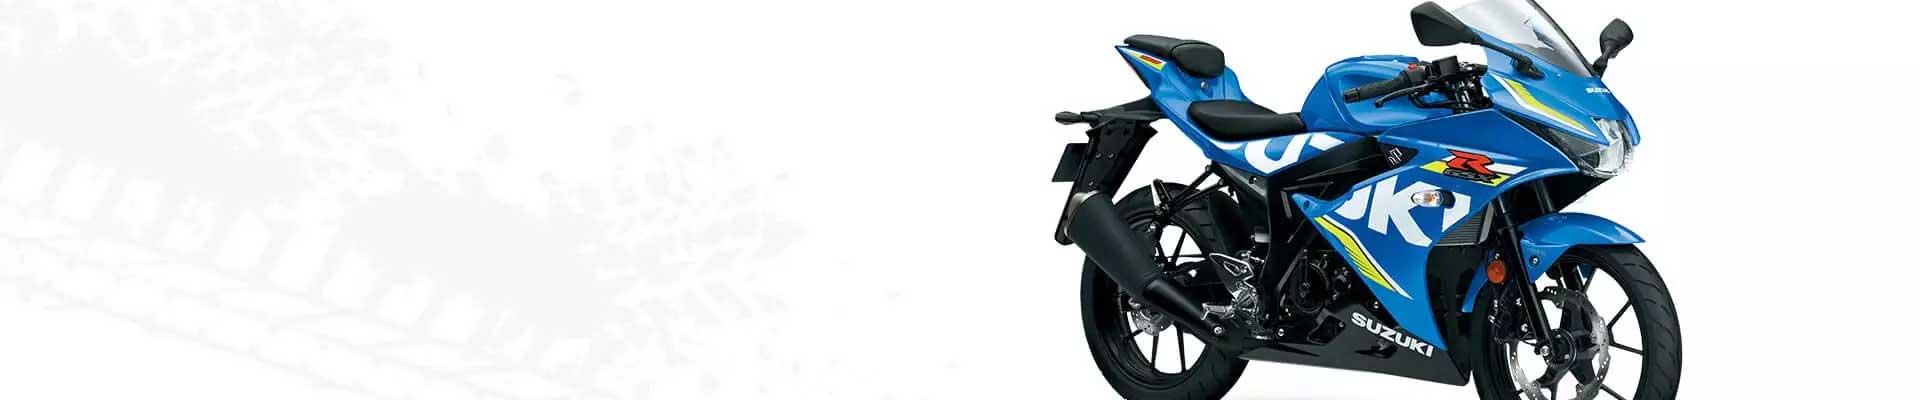 suzuki-bike